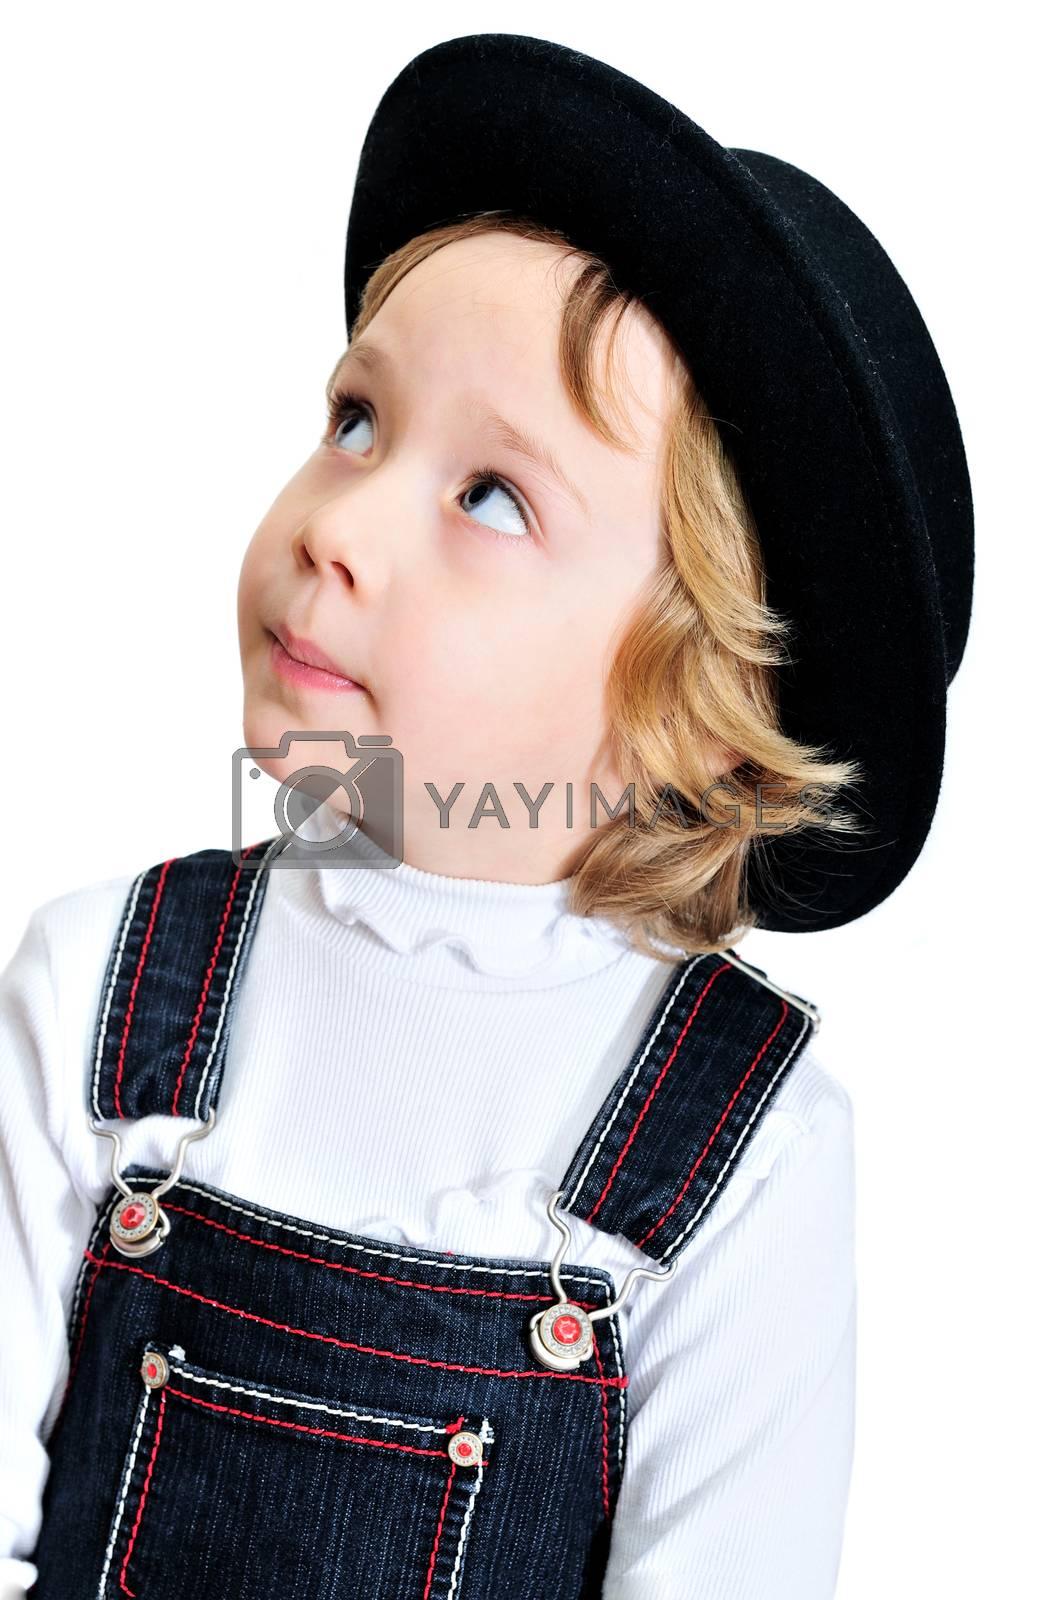 stylish funny little girl wearing black hat